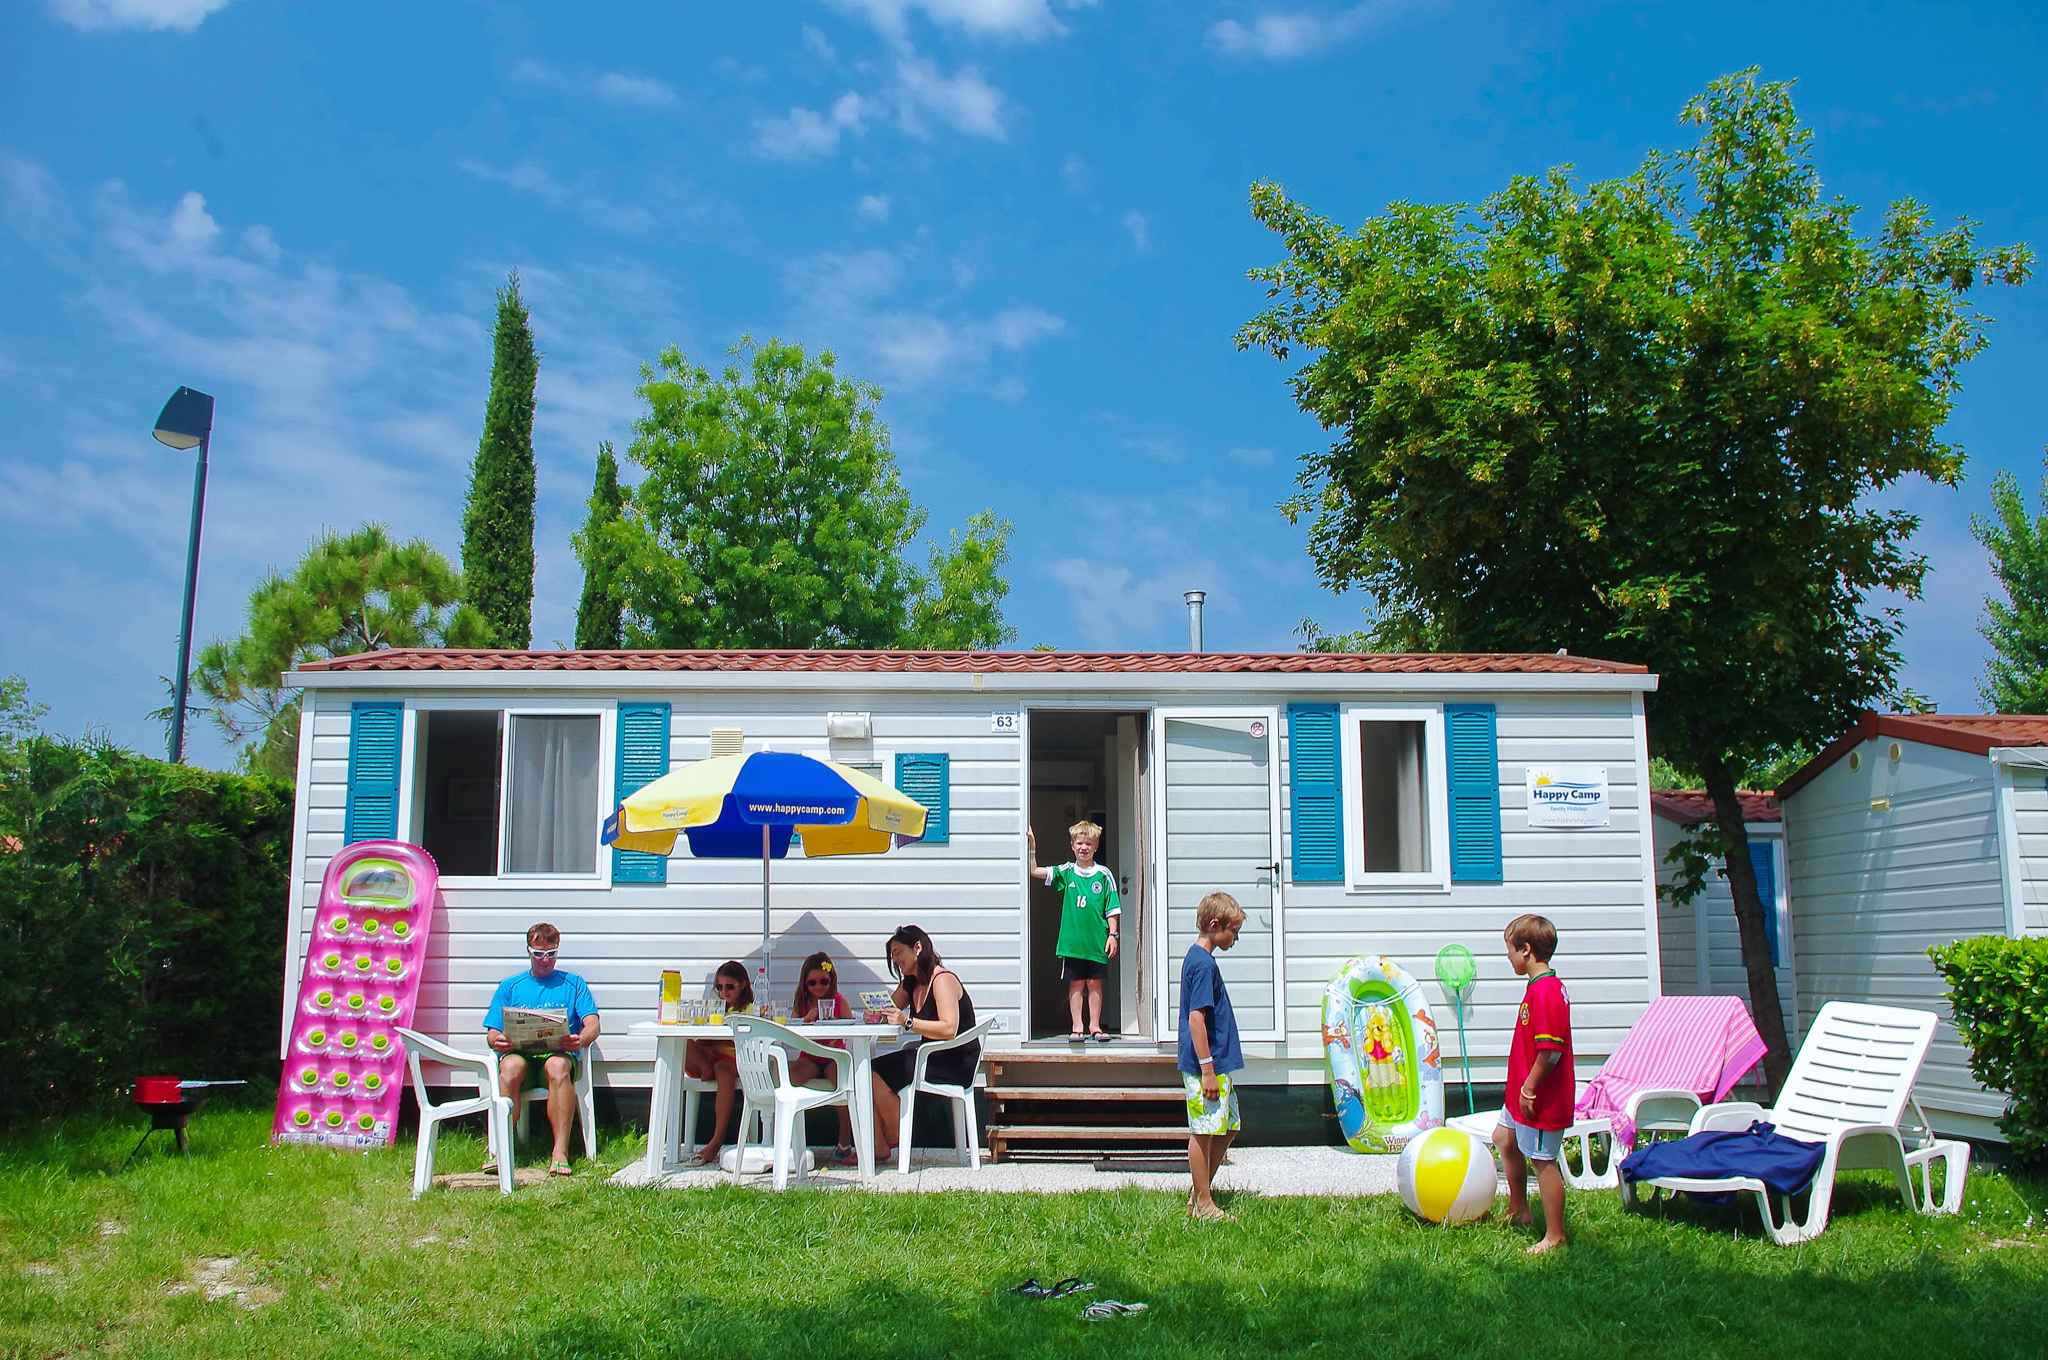 Appartement de vacances Mobilehome mit Tischtennis und Fahrradverleih (2483443), San Vito Lo Capo, Trapani, Sicile, Italie, image 3